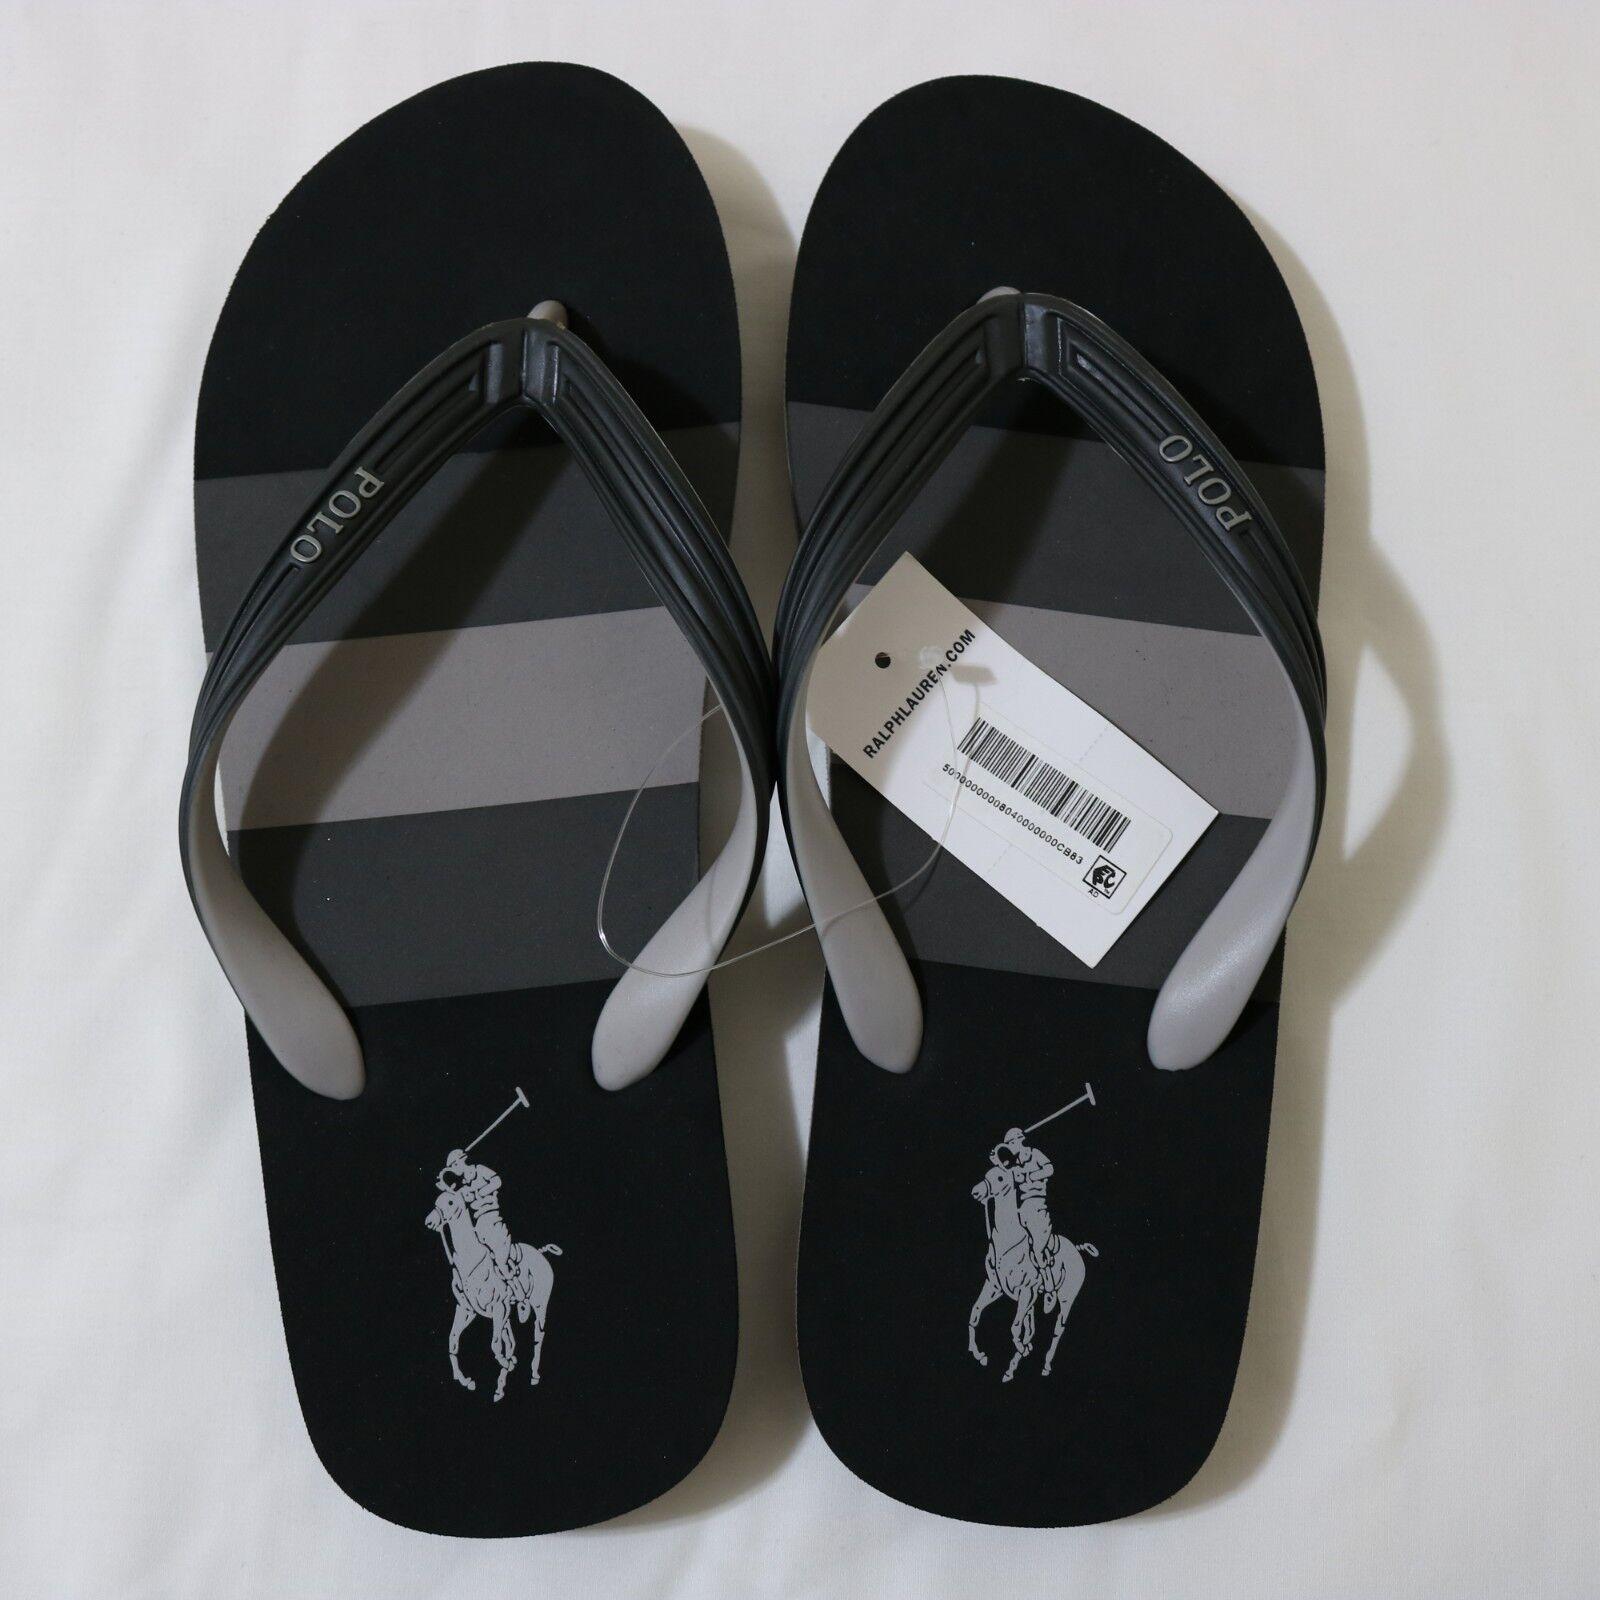 a407bf9cb2af Polo Ralph Lauren Men Summer Rubber flip flip flip flop size 9